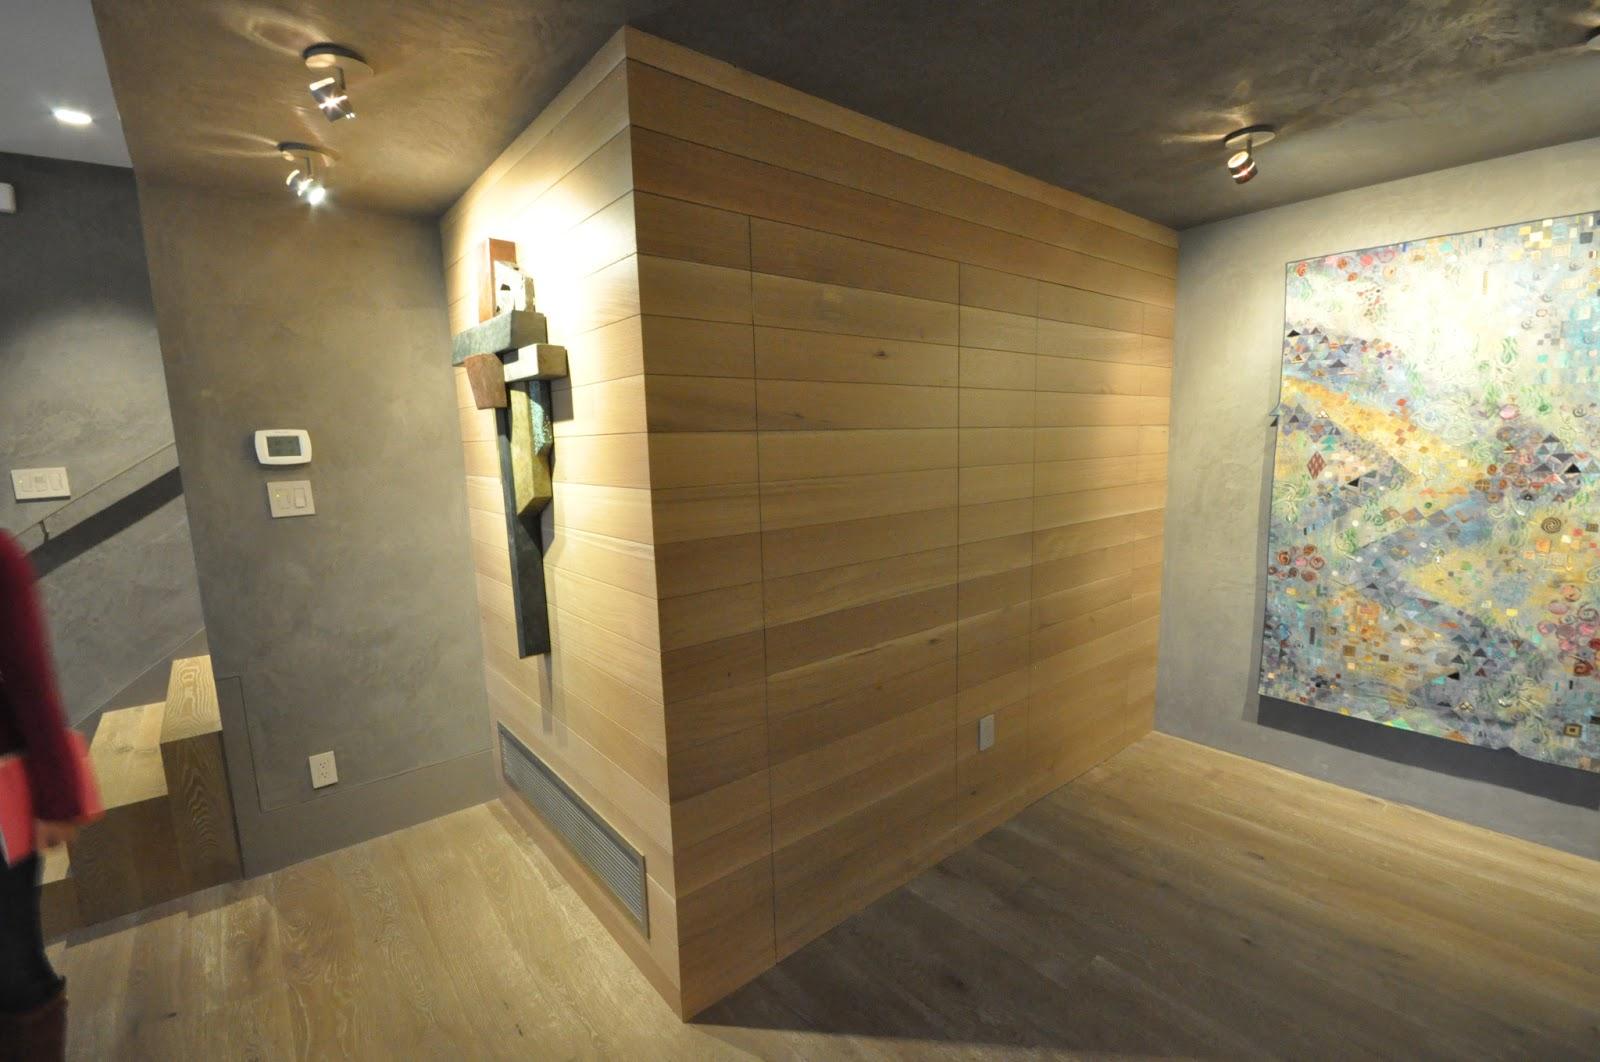 Oak paneled basement wall with two hidden doors, both doors closed